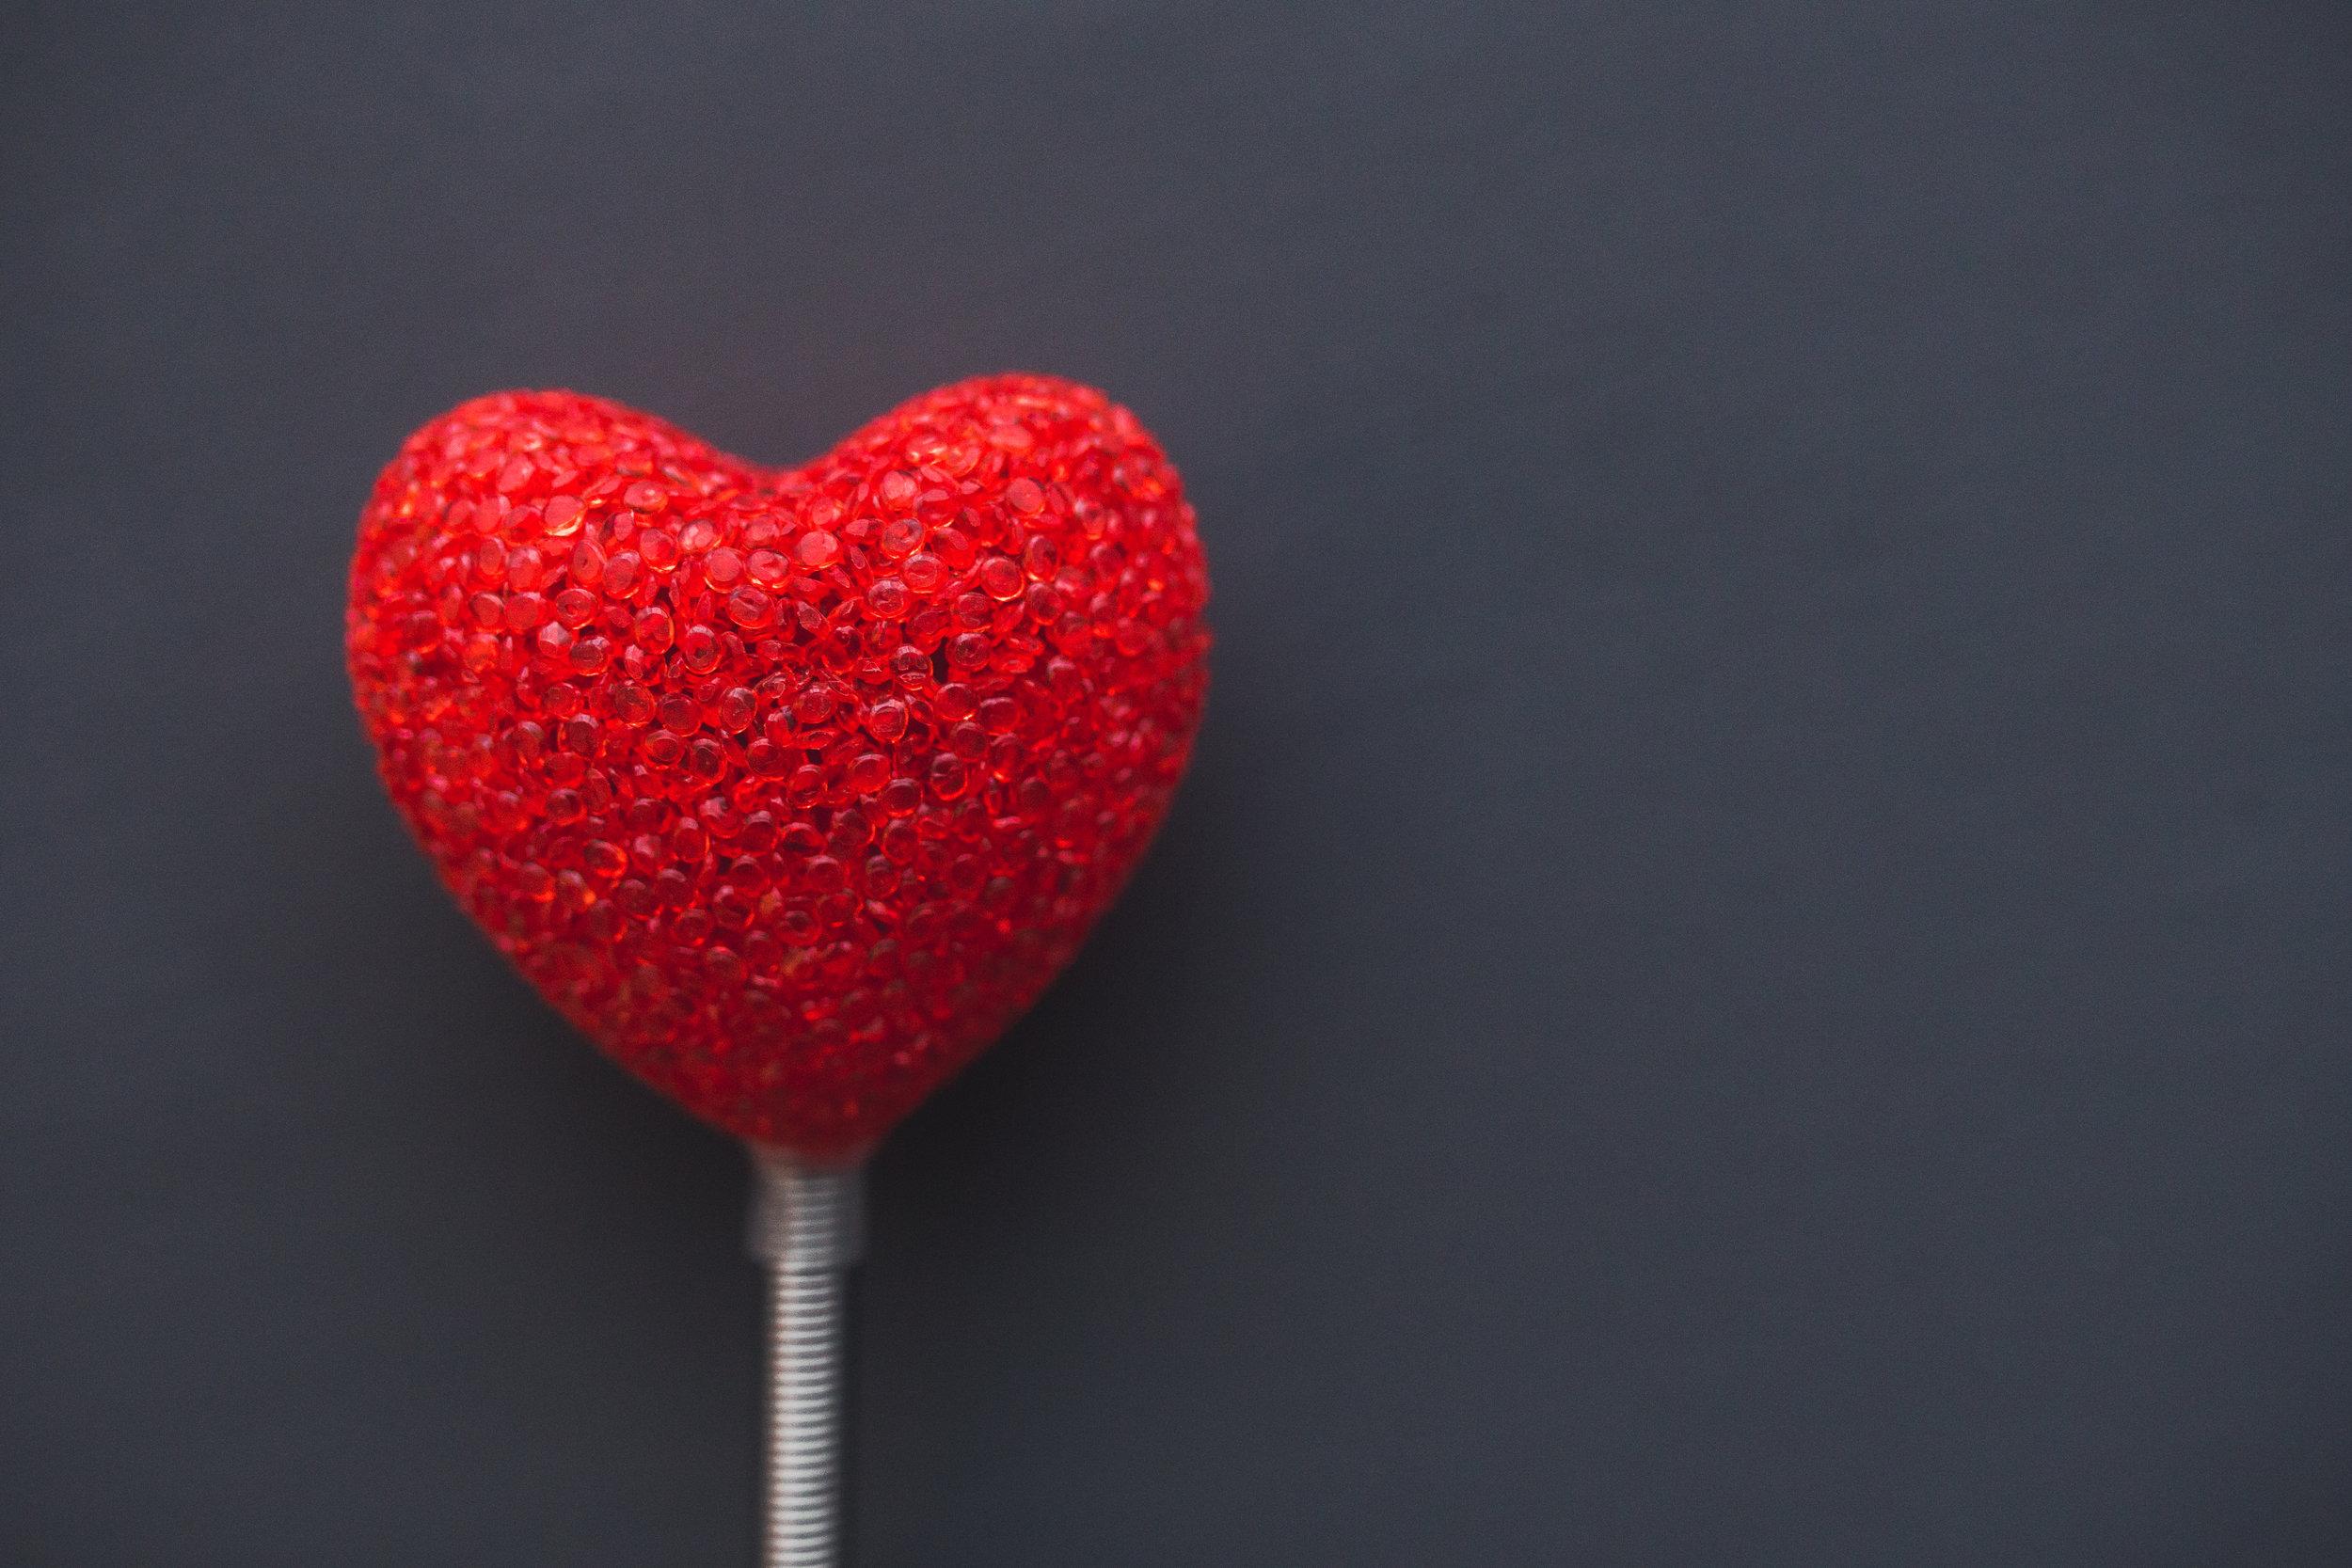 Canva - Big red heart on dark background.jpg